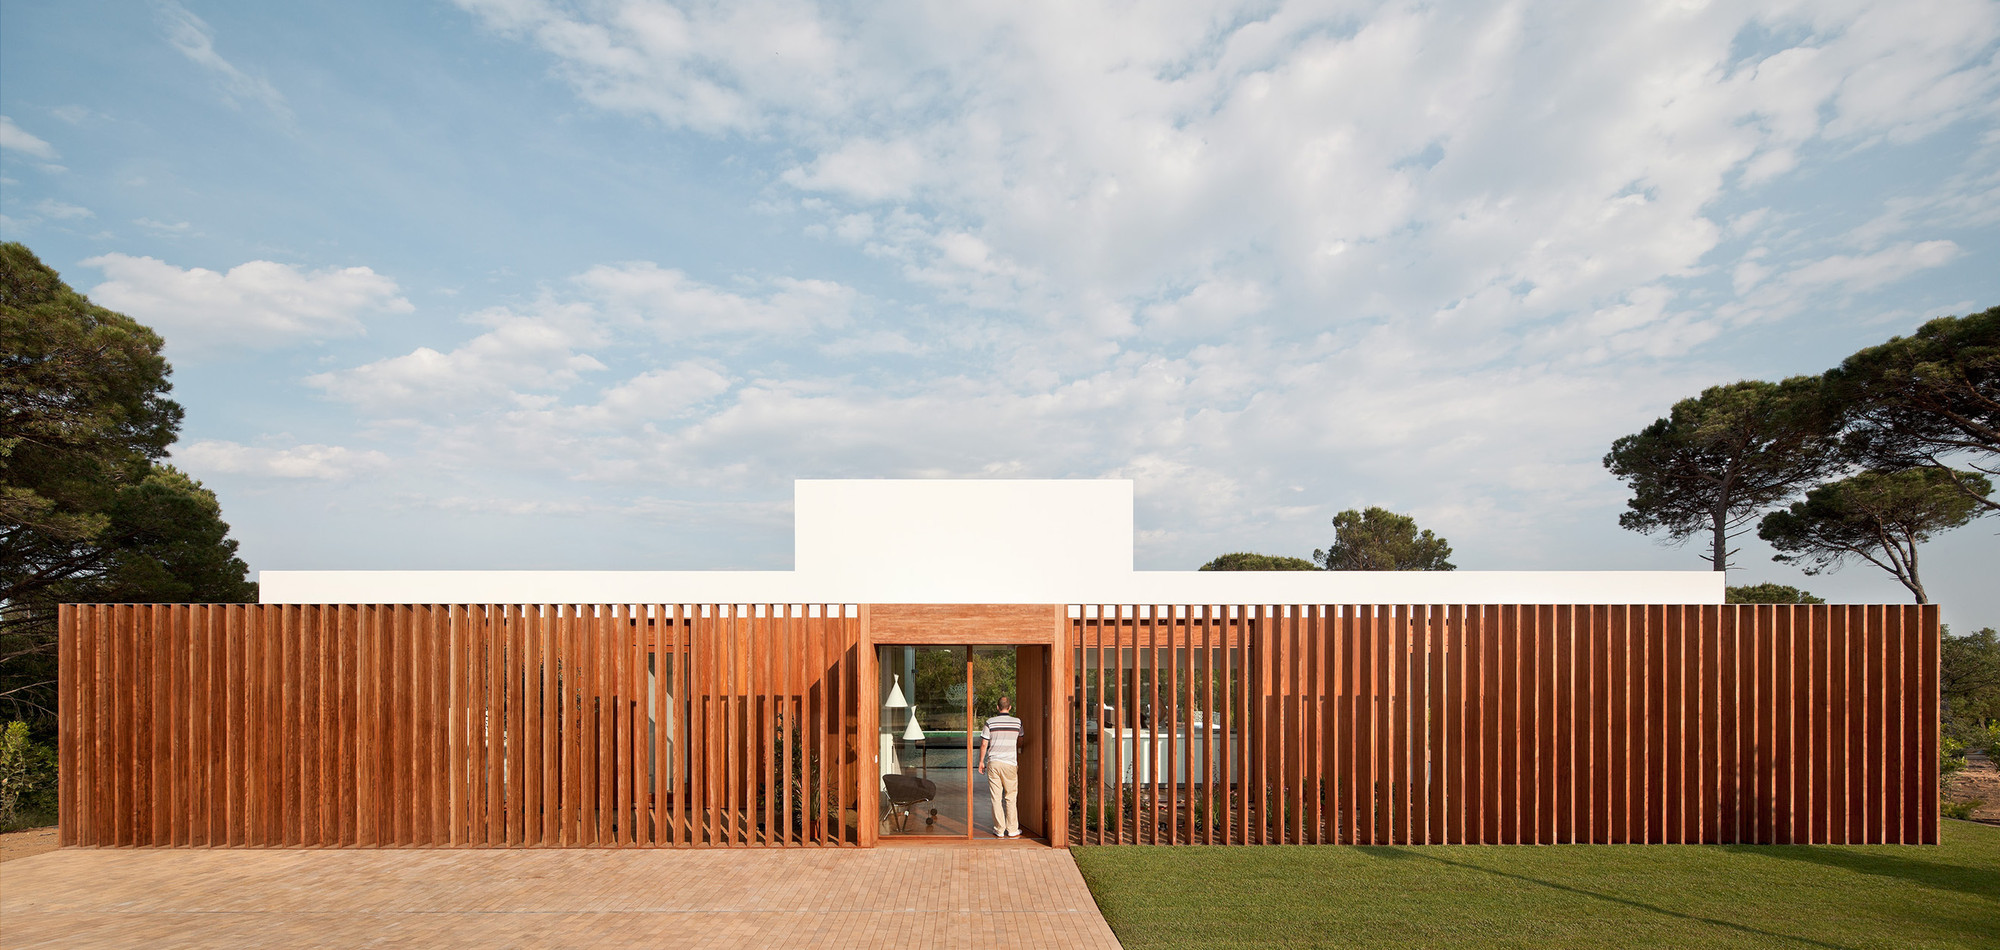 SIFERA House / Josep Camps & Olga Felip, © Pedro Pegenaute